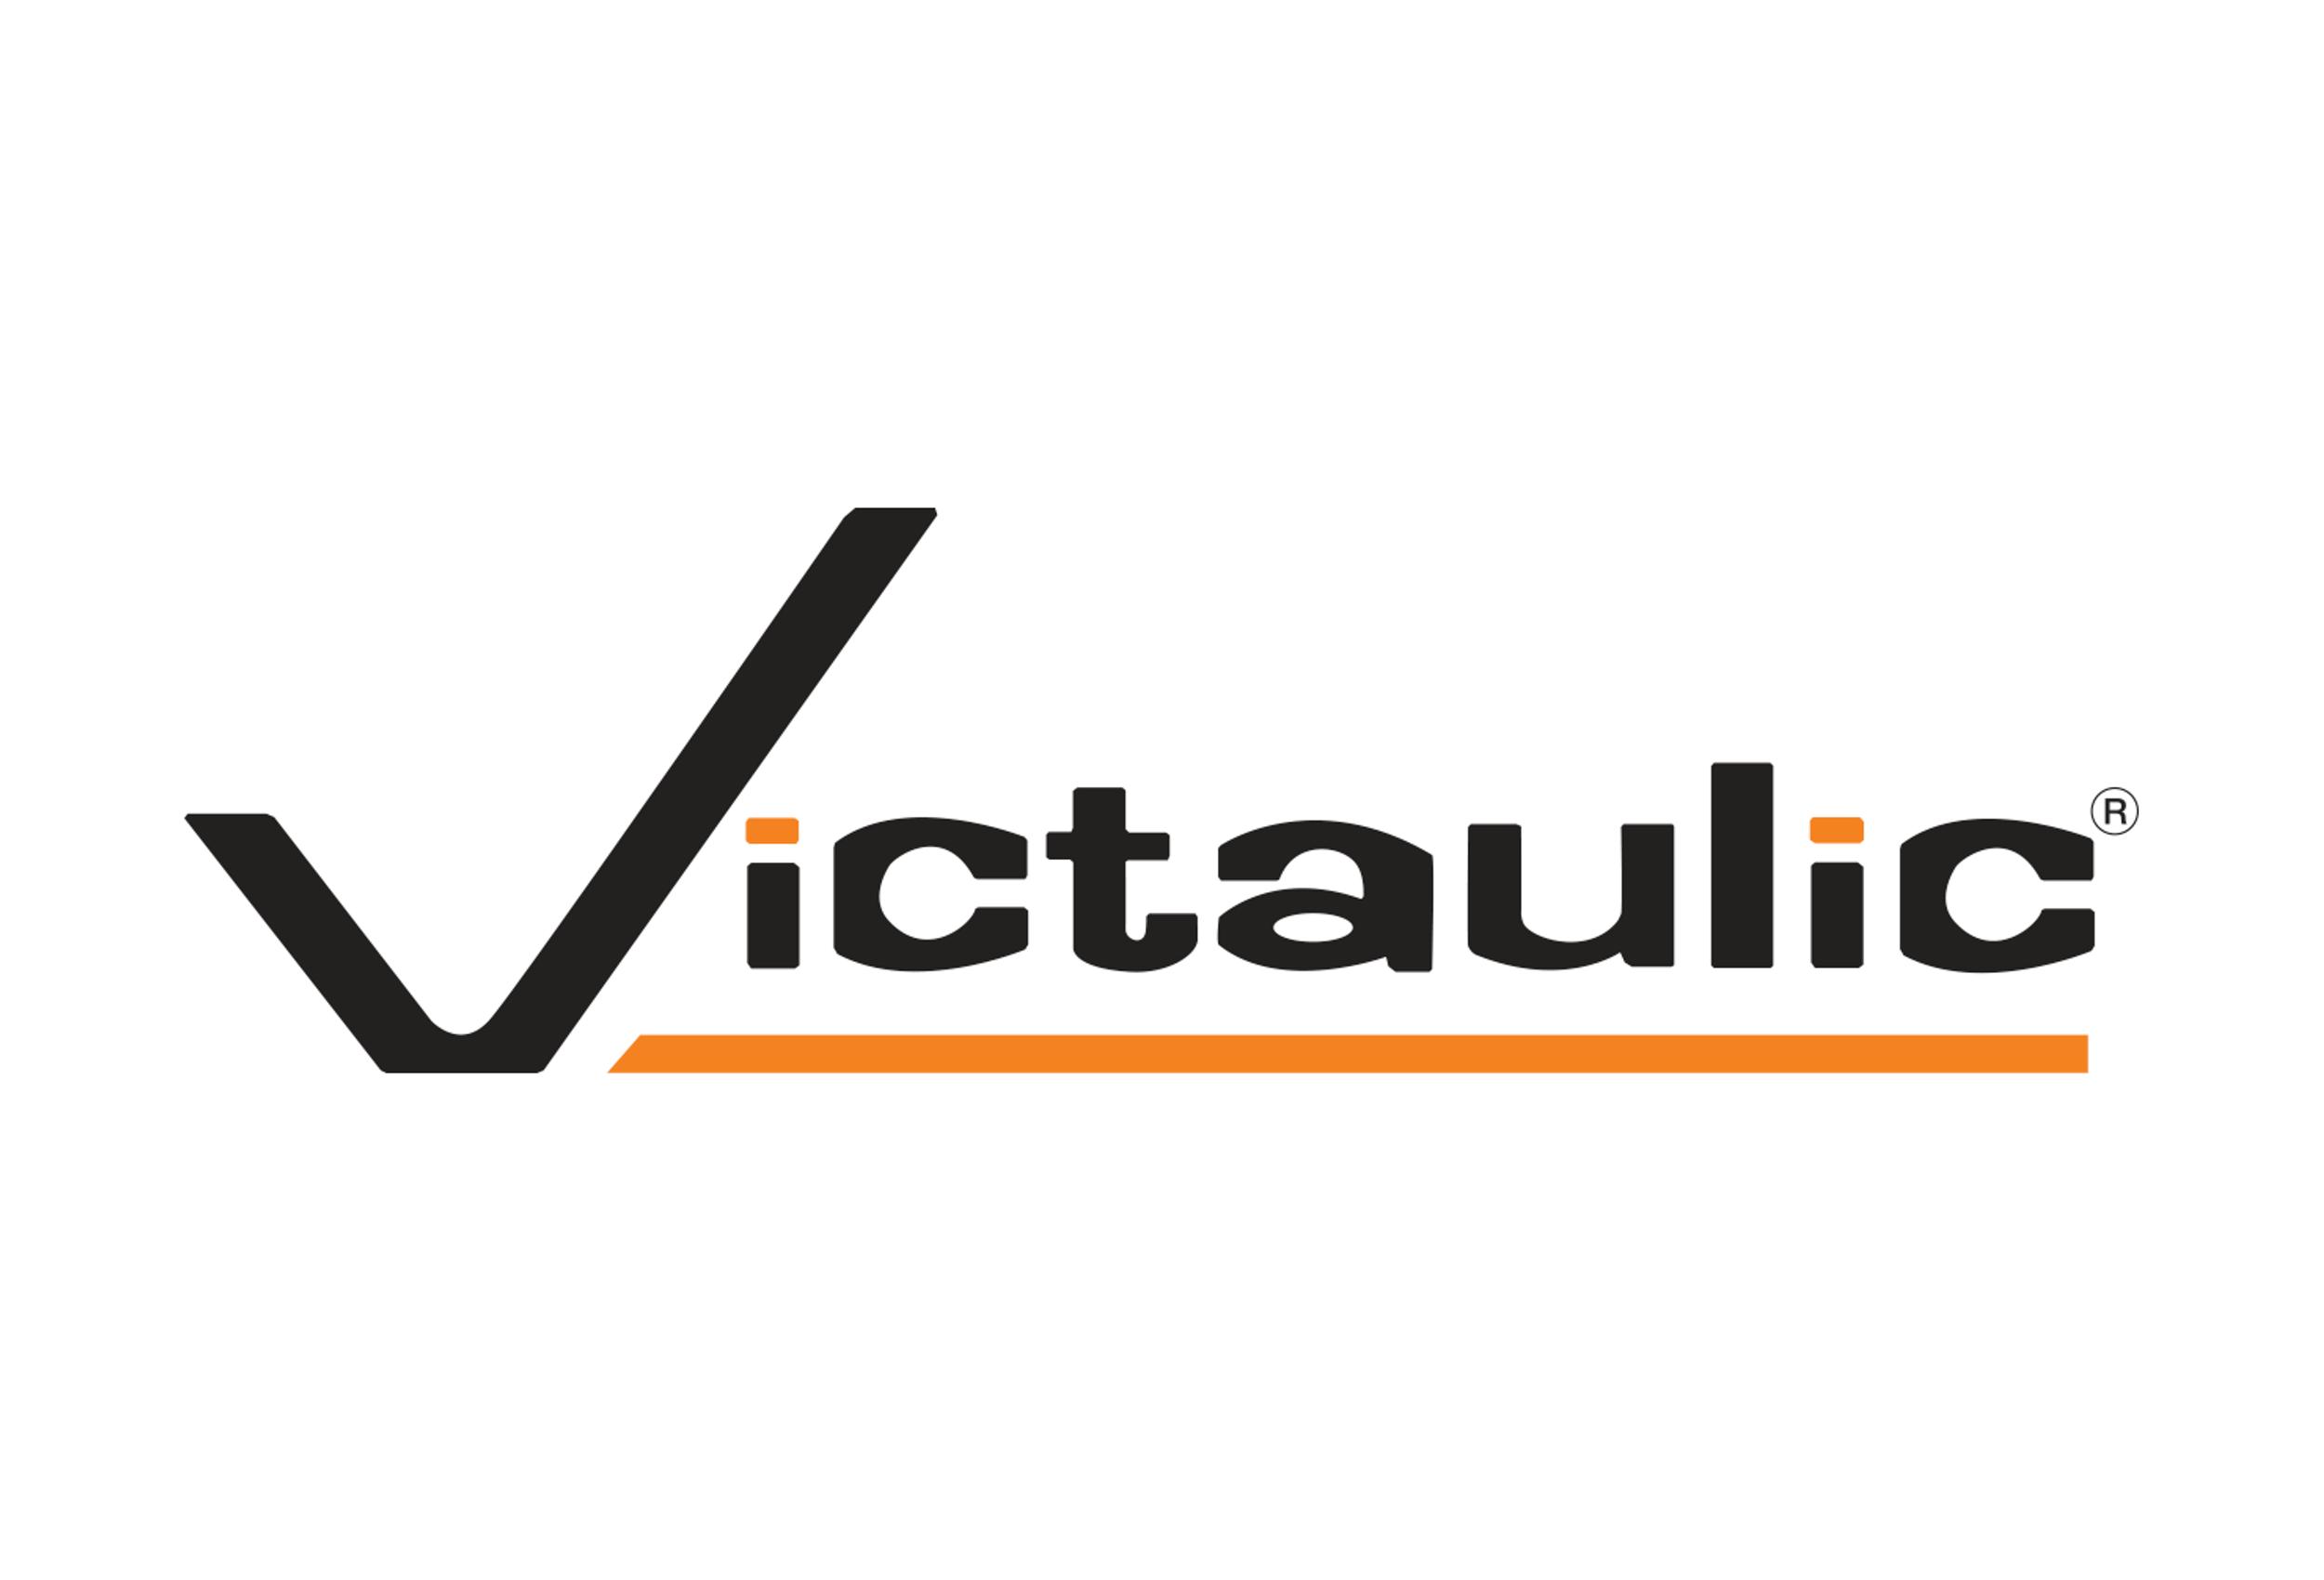 Victaulic_sponsor.png